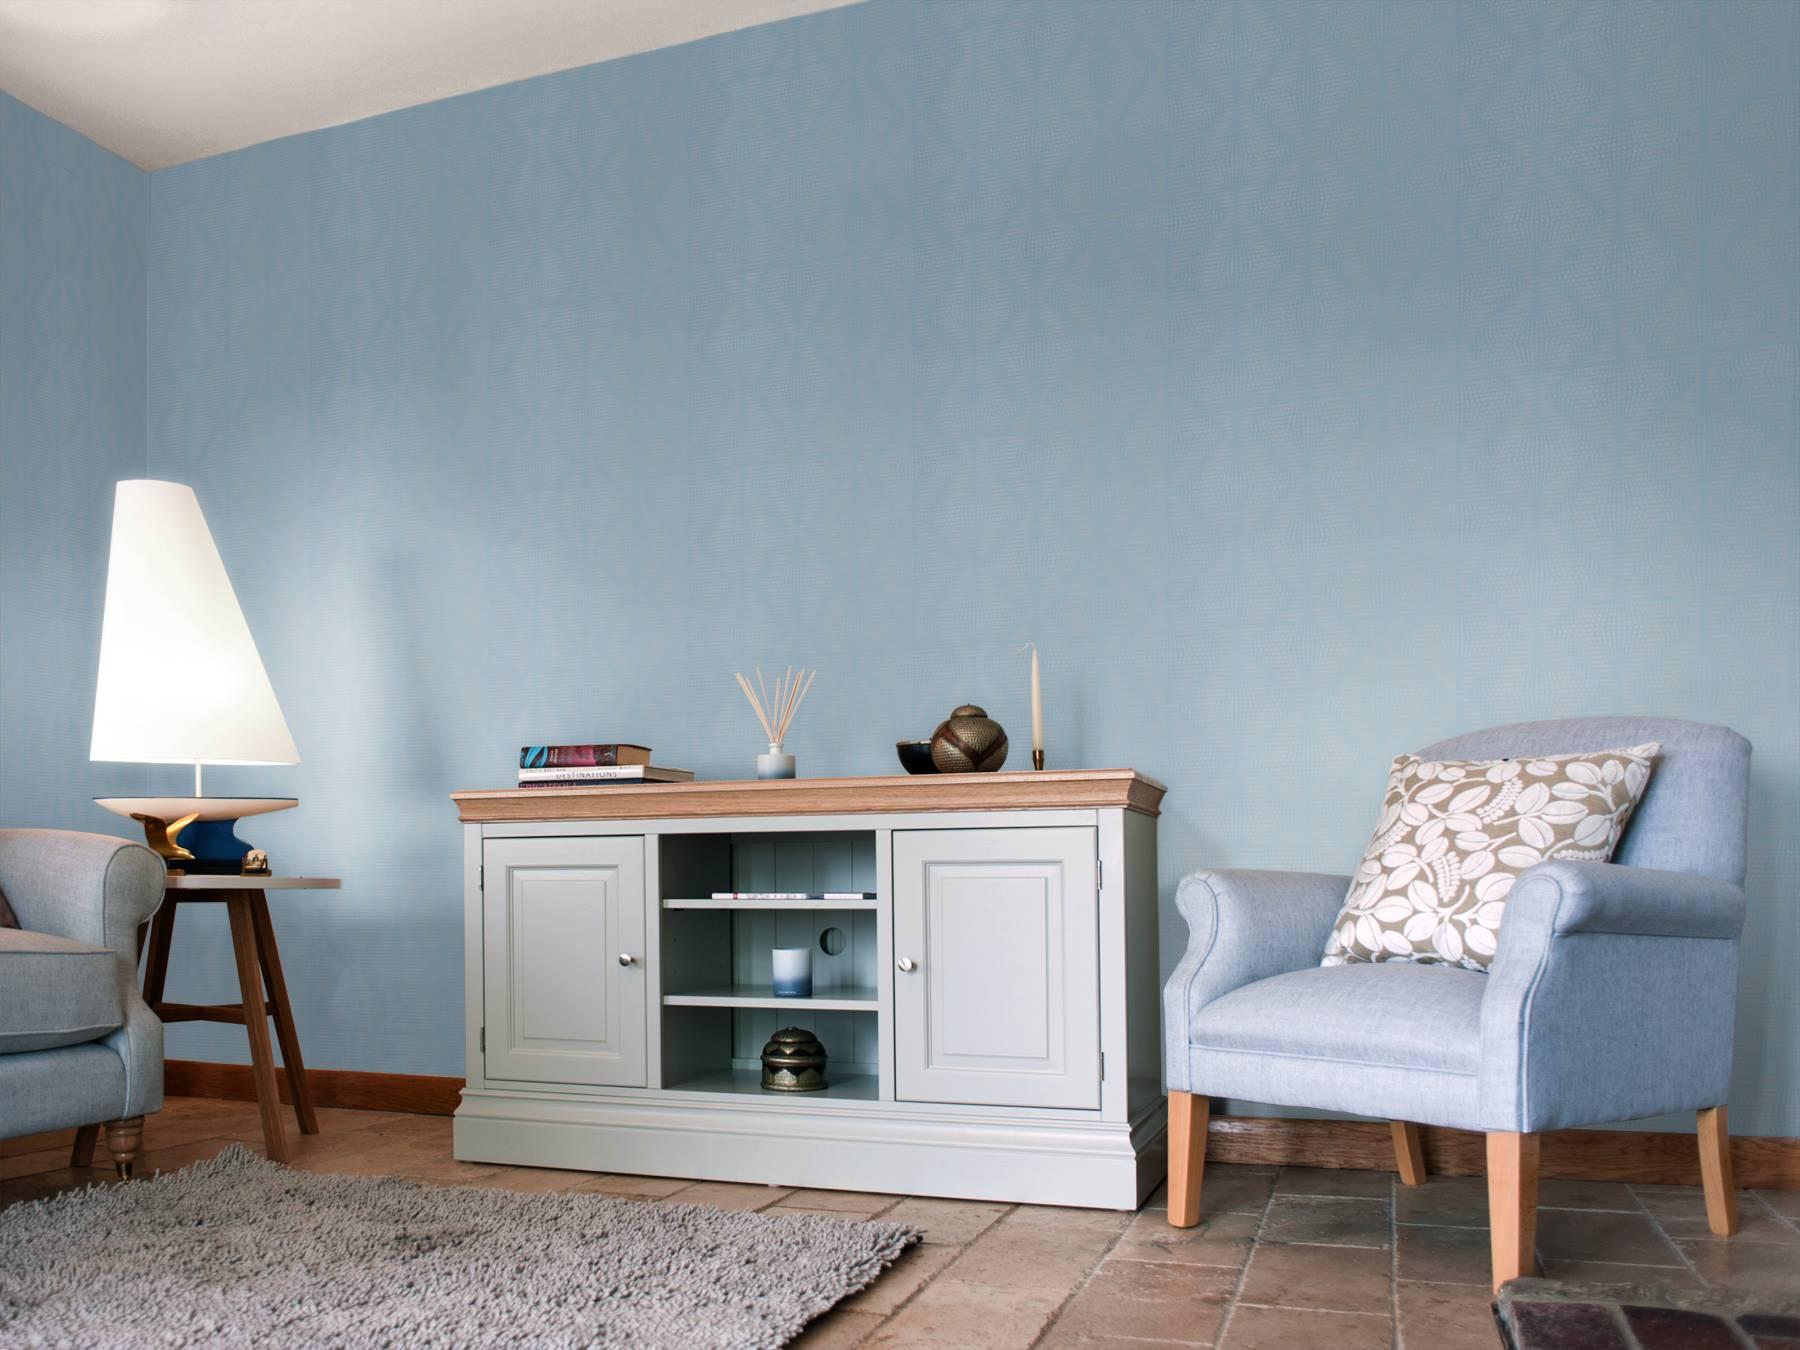 Ruhlmann Roomset Image - Osborne And Little Carlotta - HD Wallpaper